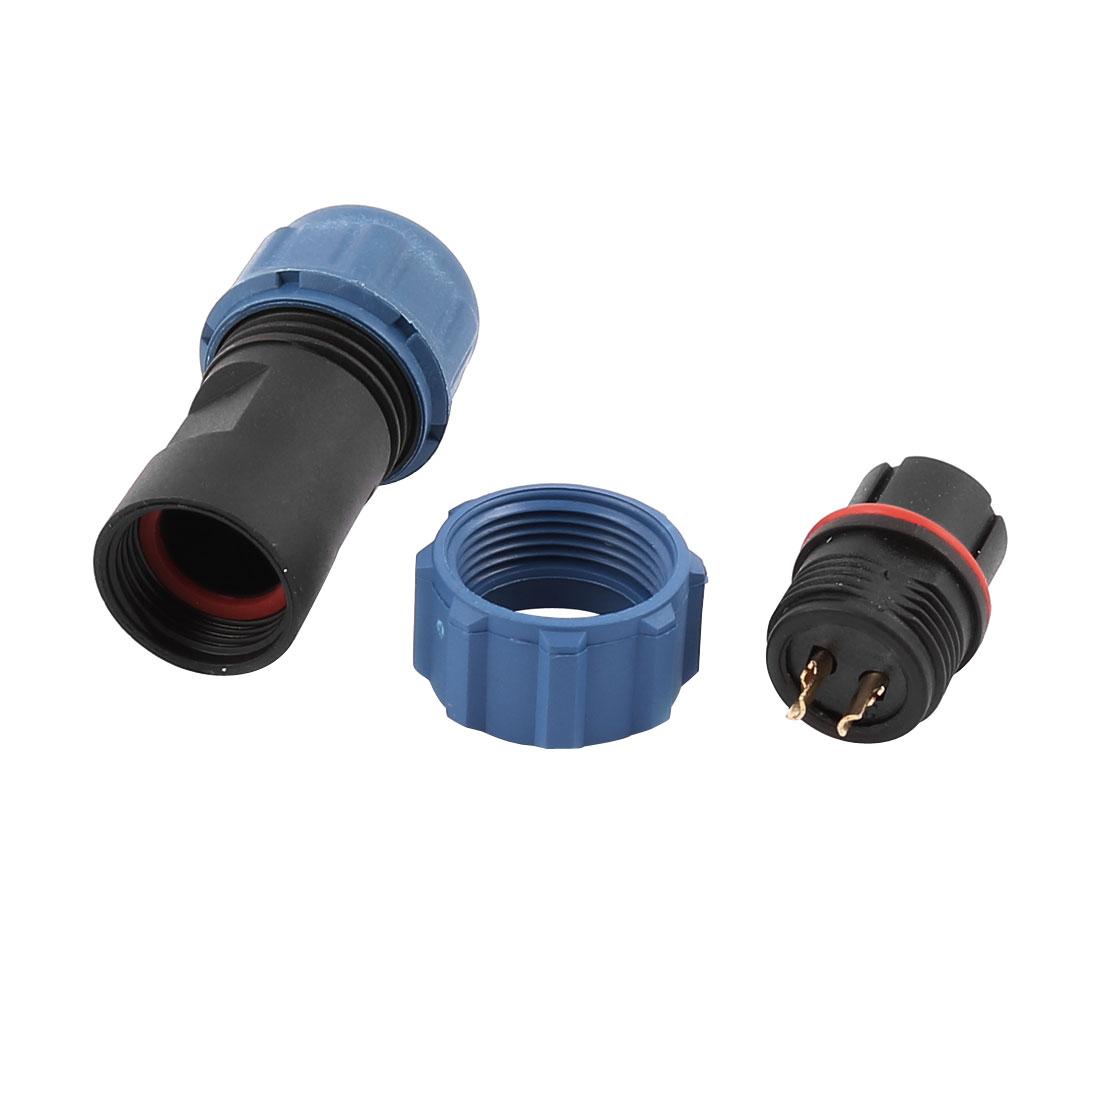 AC 250V 2 Poles SP1310/S Waterproof Aviation Socket Dustproof Adapter Connector